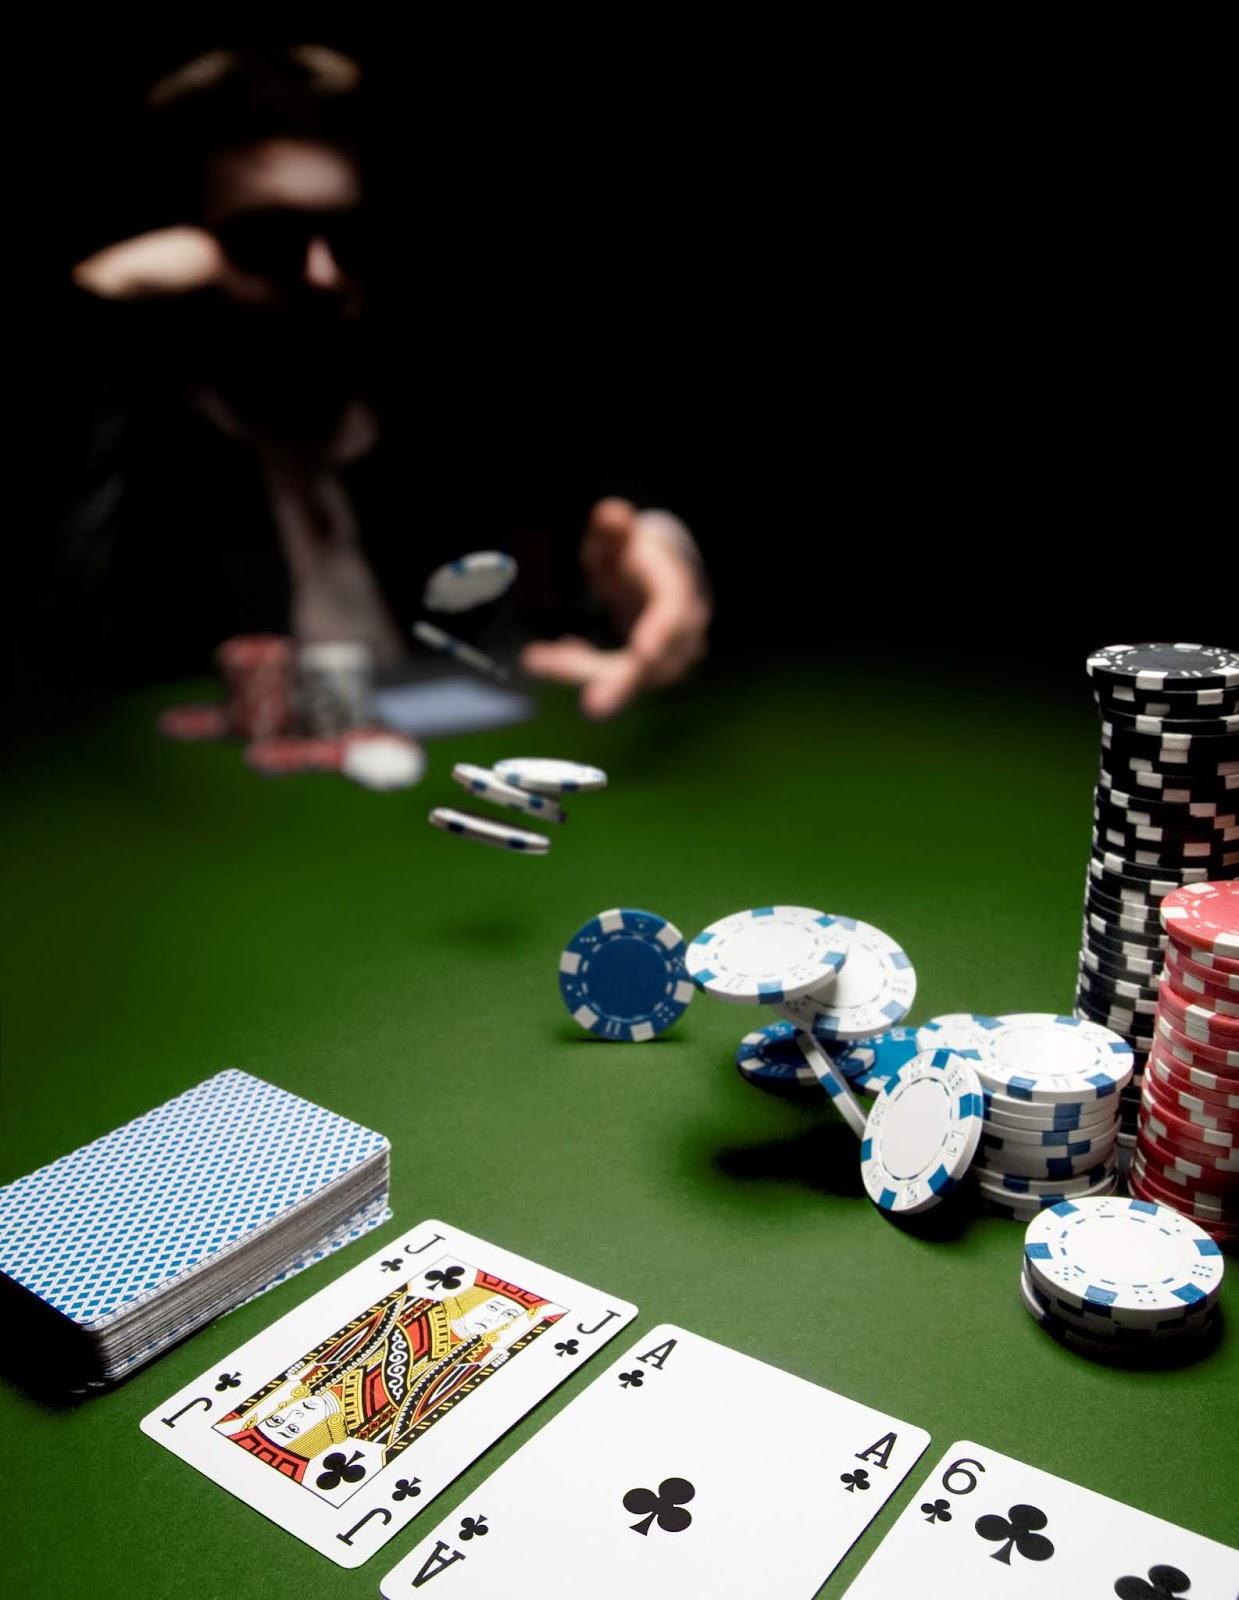 Link Login Alternatif Sabung Ayam S128 Situs Poker Online Situs Poker Online Terbaik Indonesia